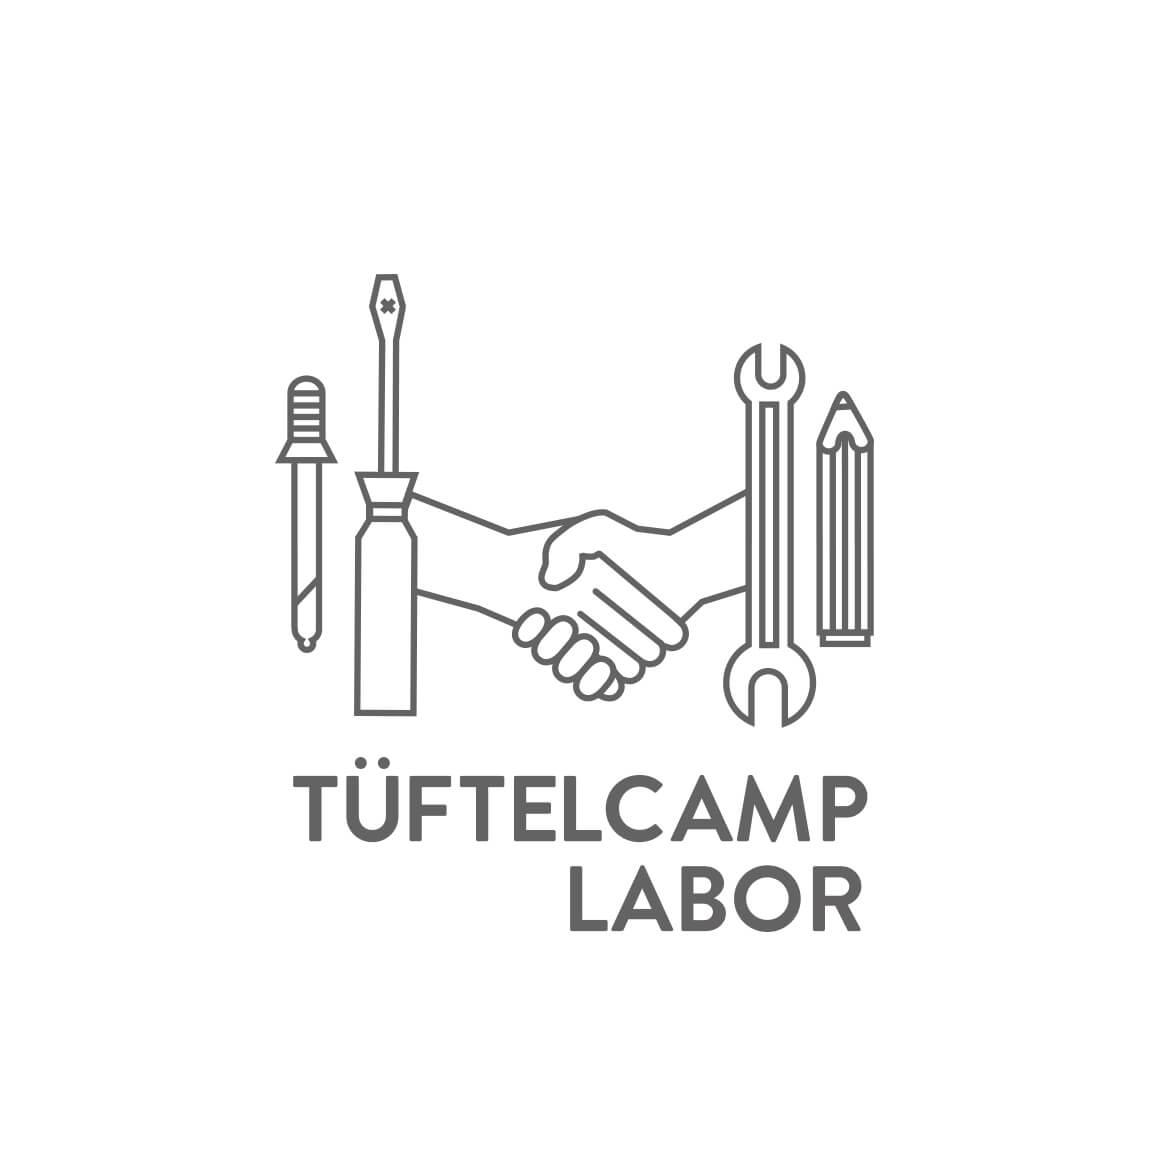 Tueftelcamp_Labor